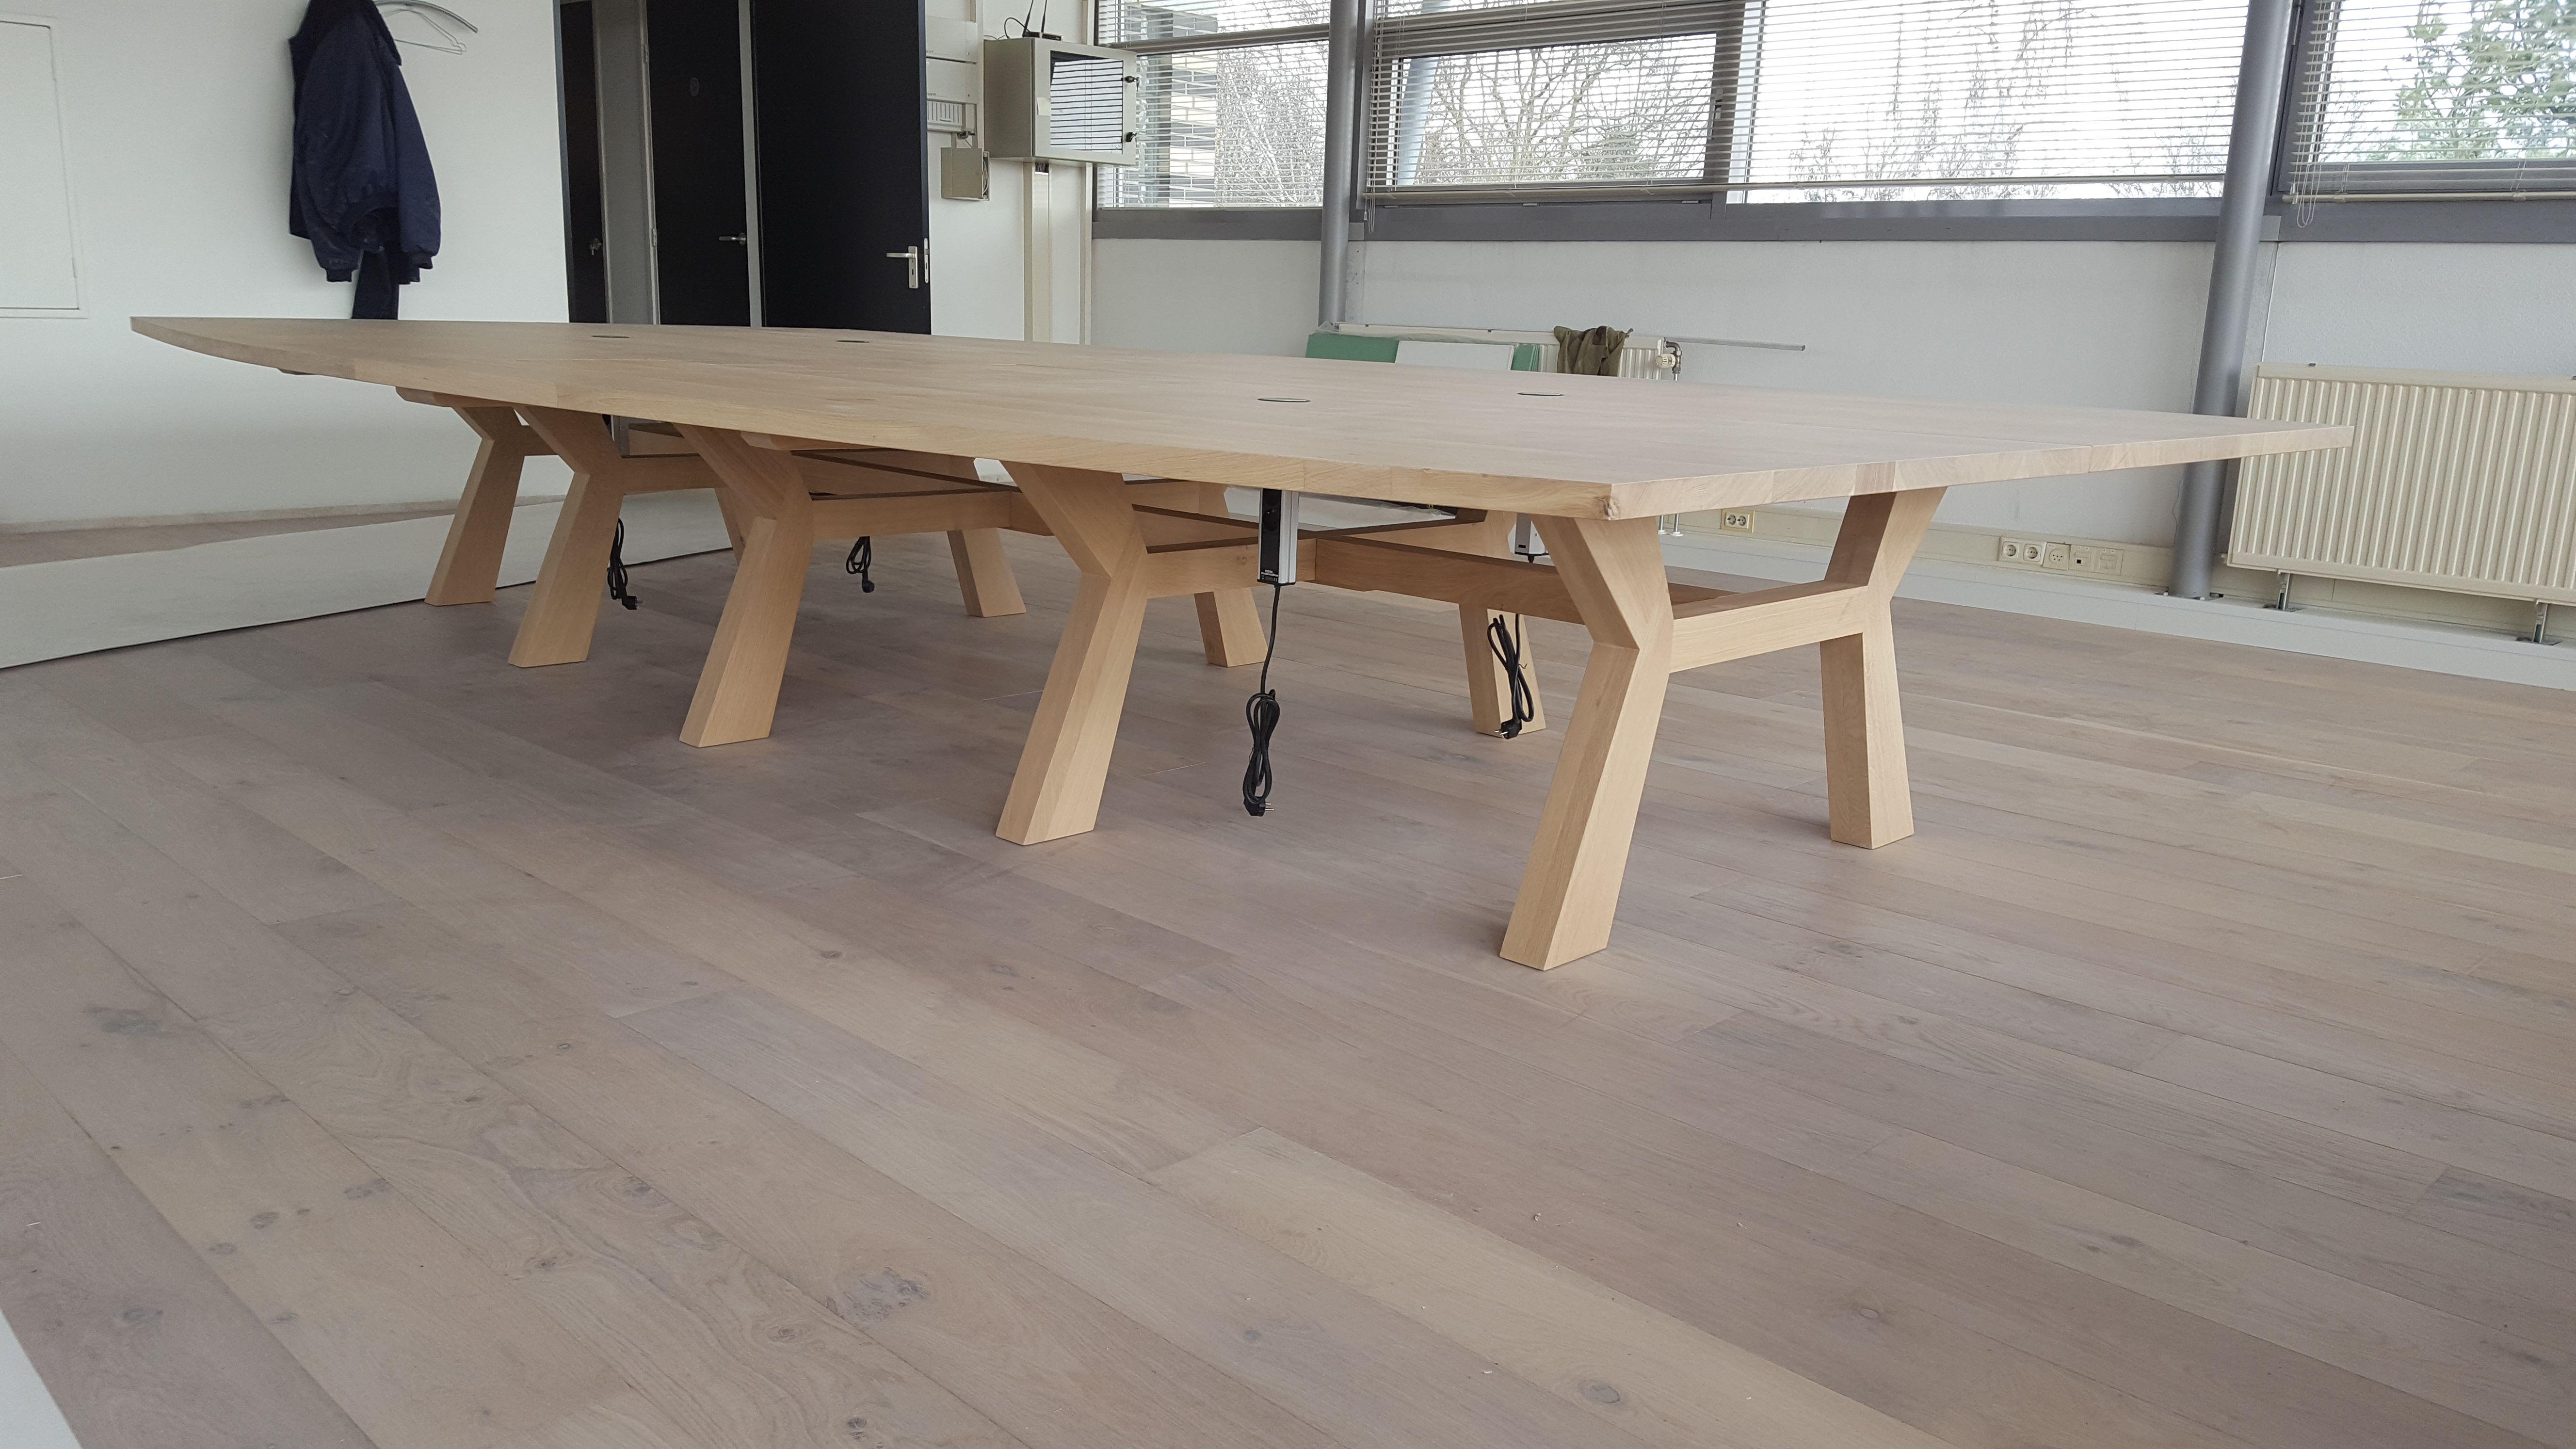 Boardroom tafel #woonkamer #woonkamerinspiratie #interieur ...